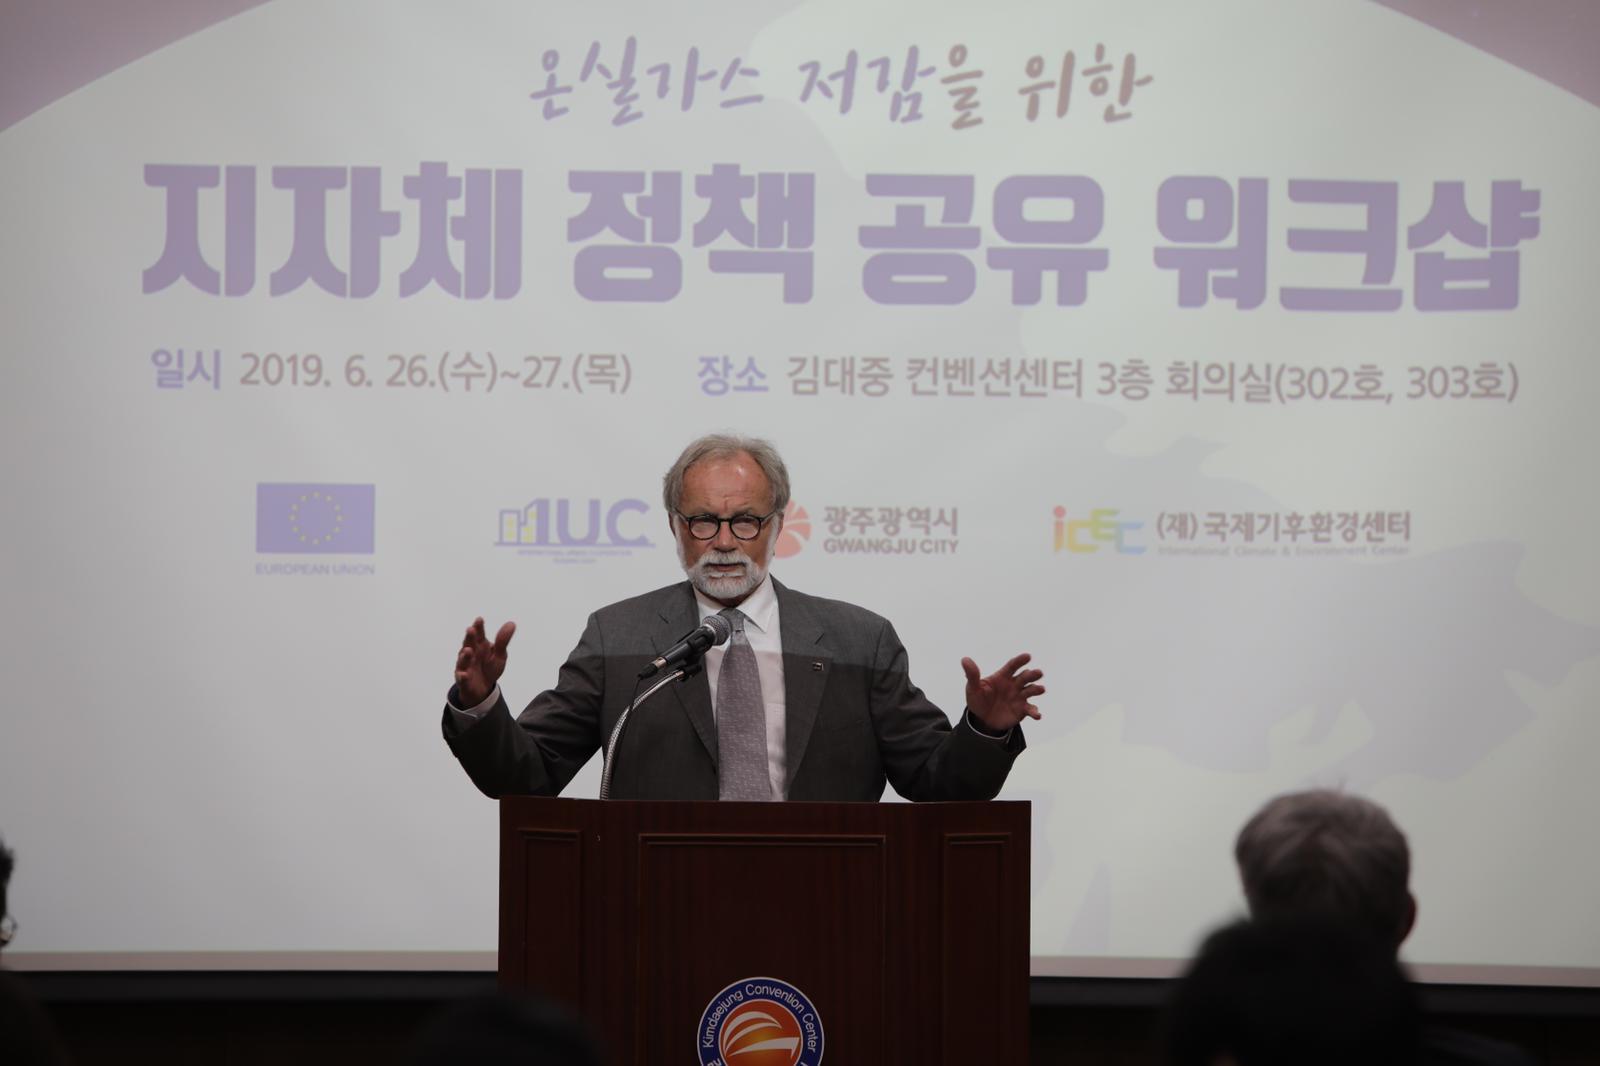 Korea: Training on mitigation & technologies in Gwangju